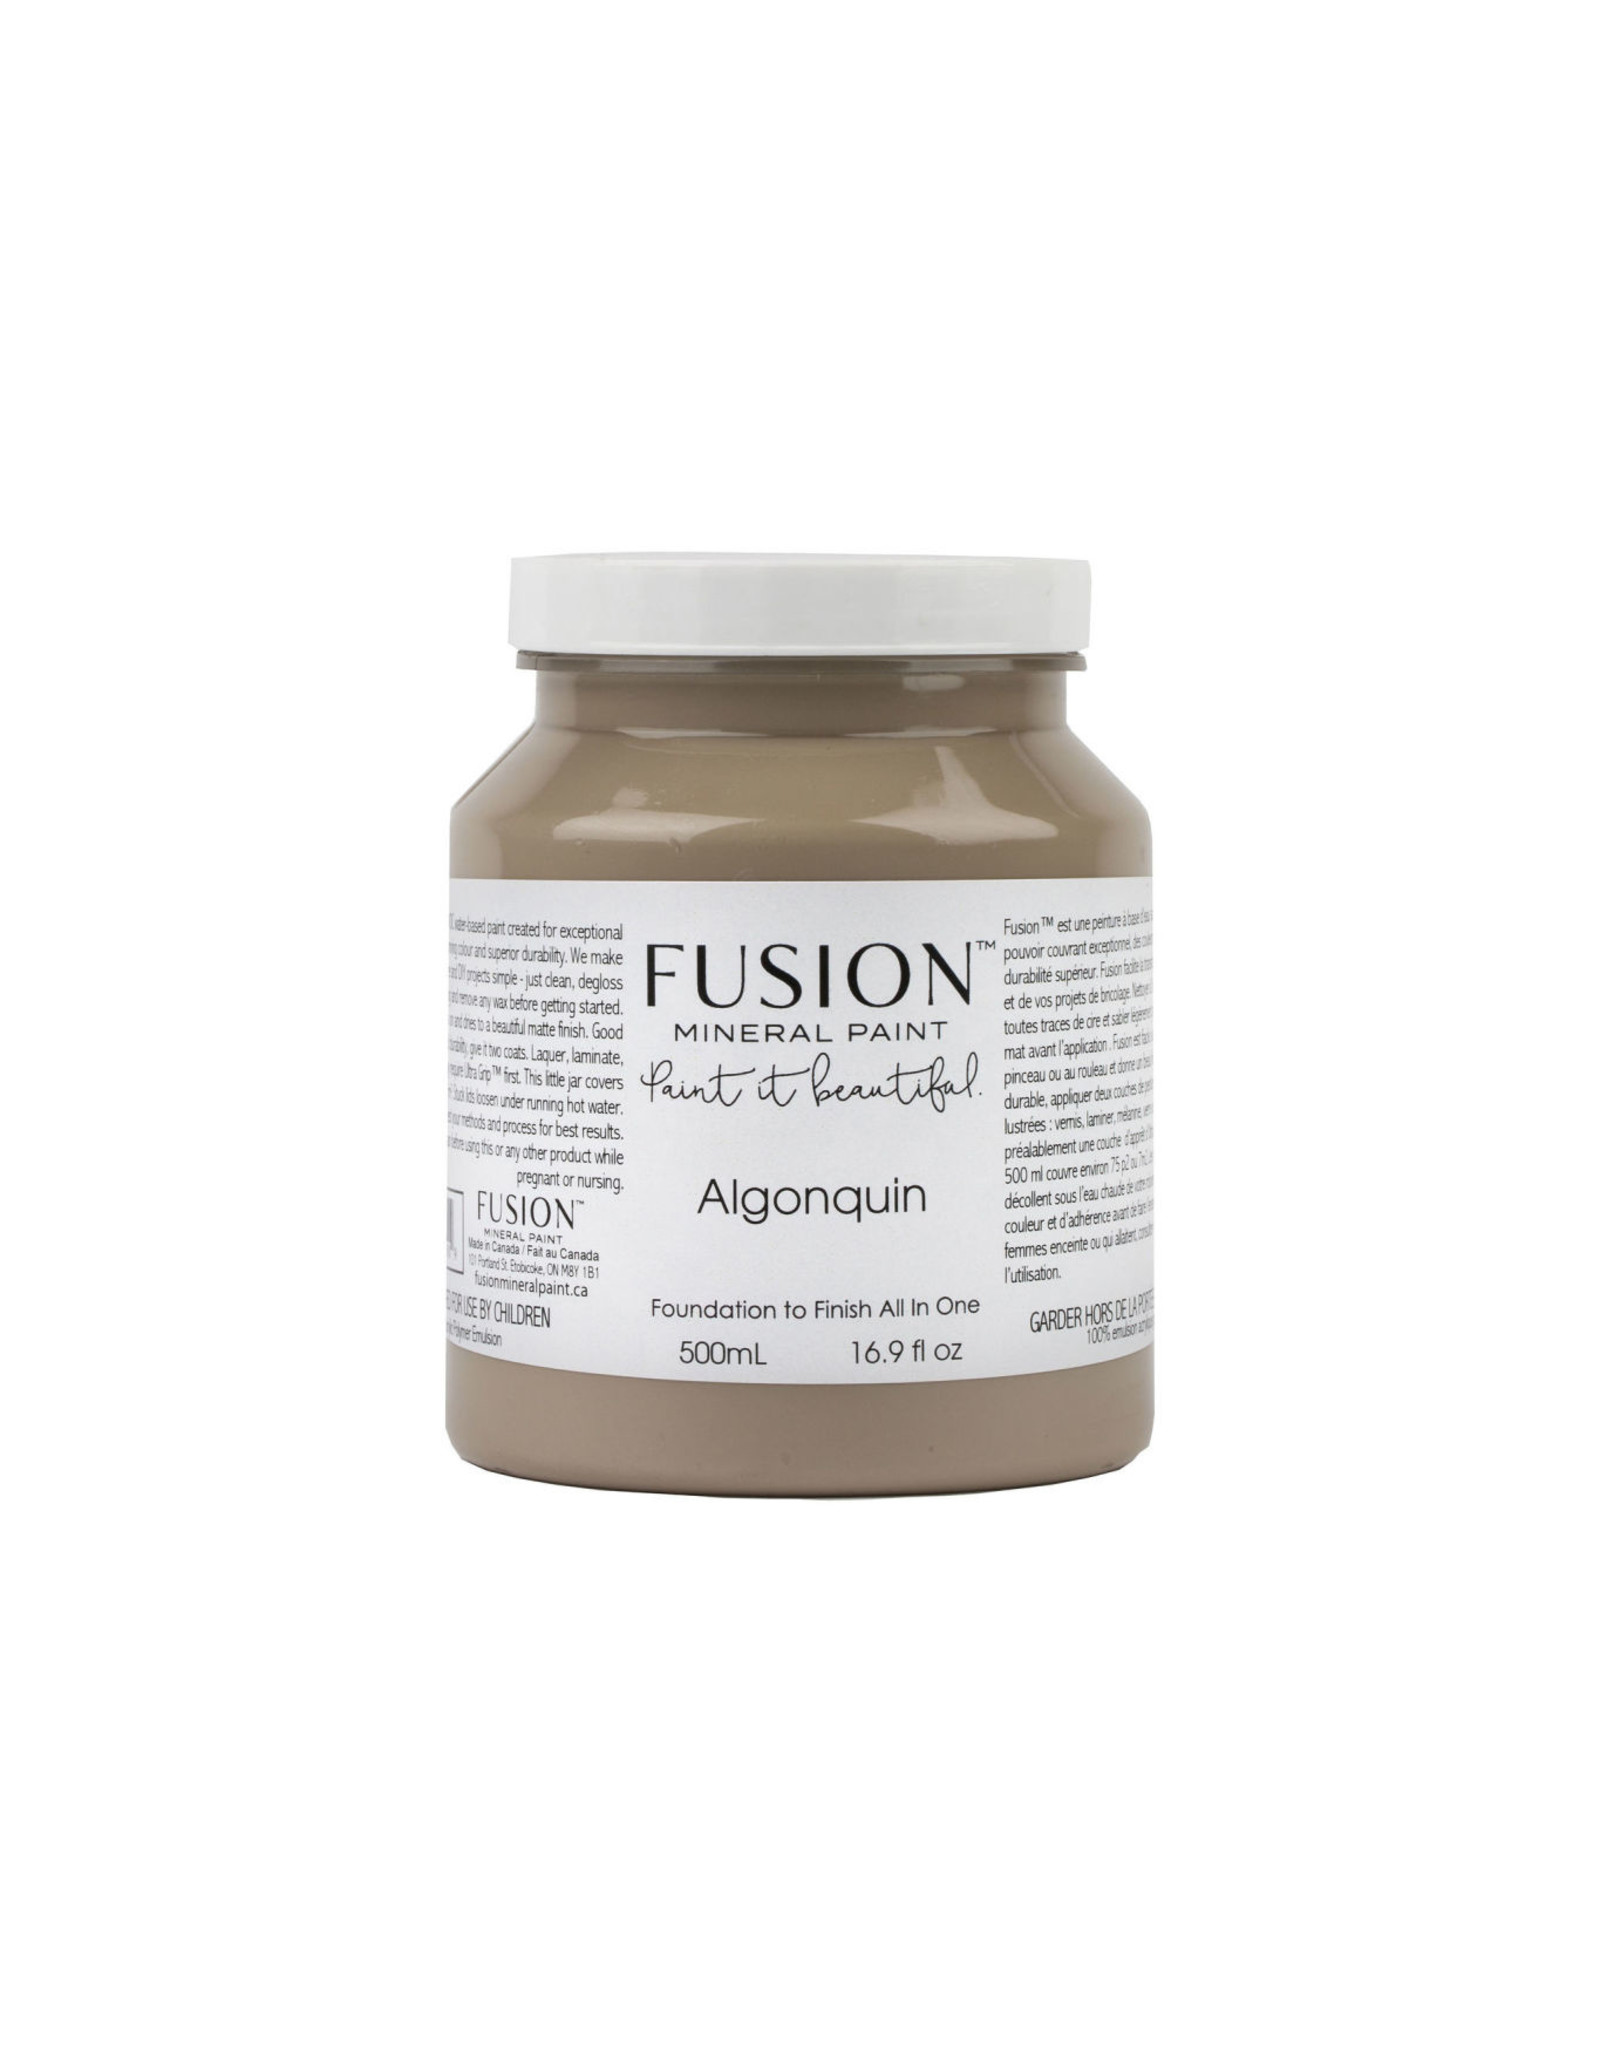 Fusion Mineral Paint Fusion Mineral Paint - Algonquin 500ml